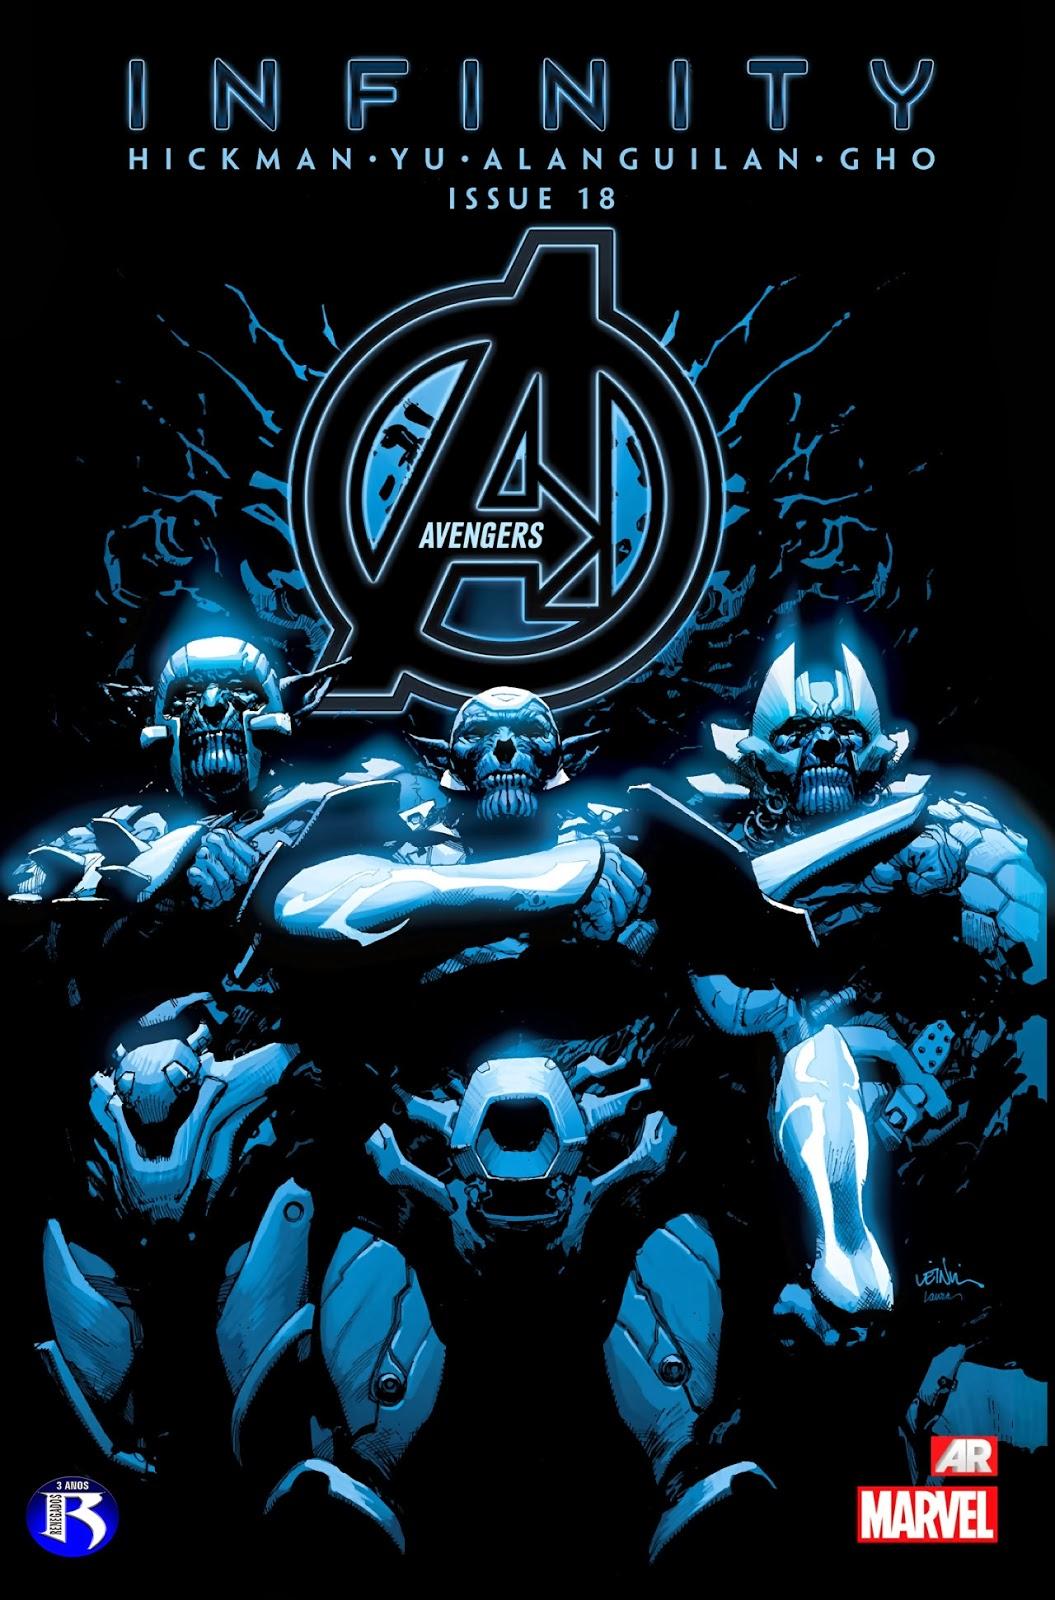 Nova Marvel! Vingadores #18